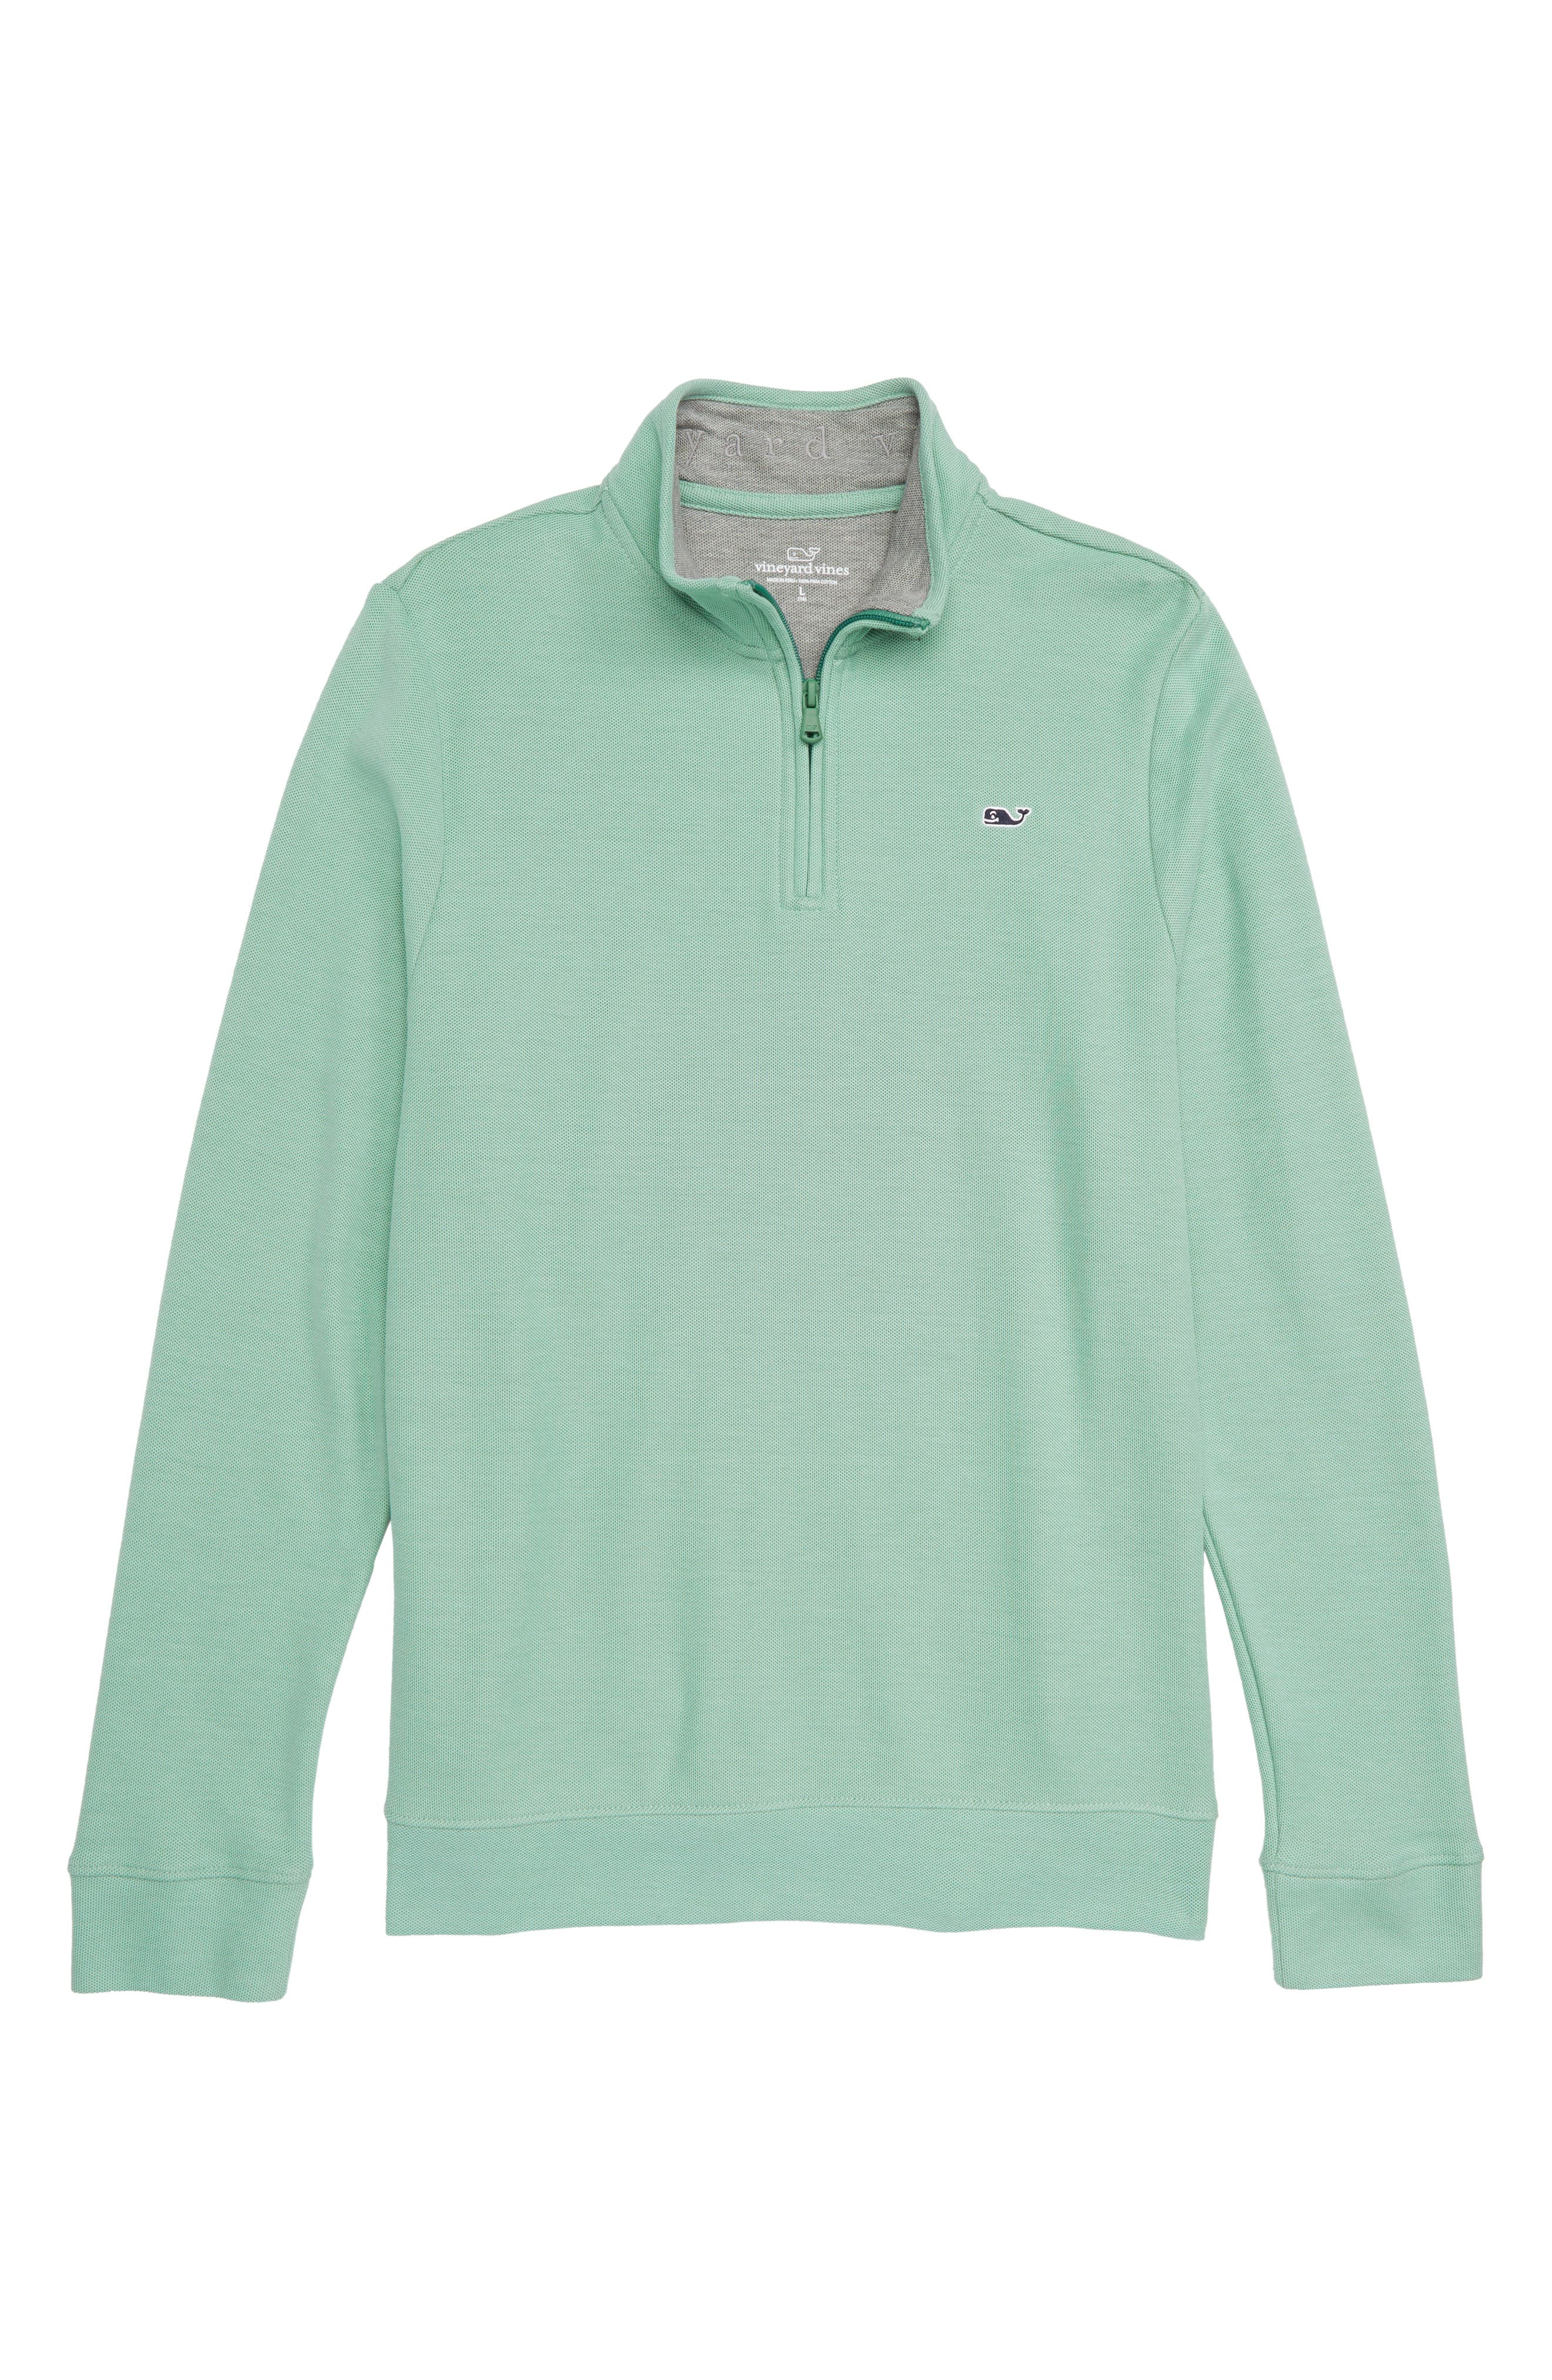 Quarter Zip Sweater,                         Main,                         color, STARBOARD GREEN